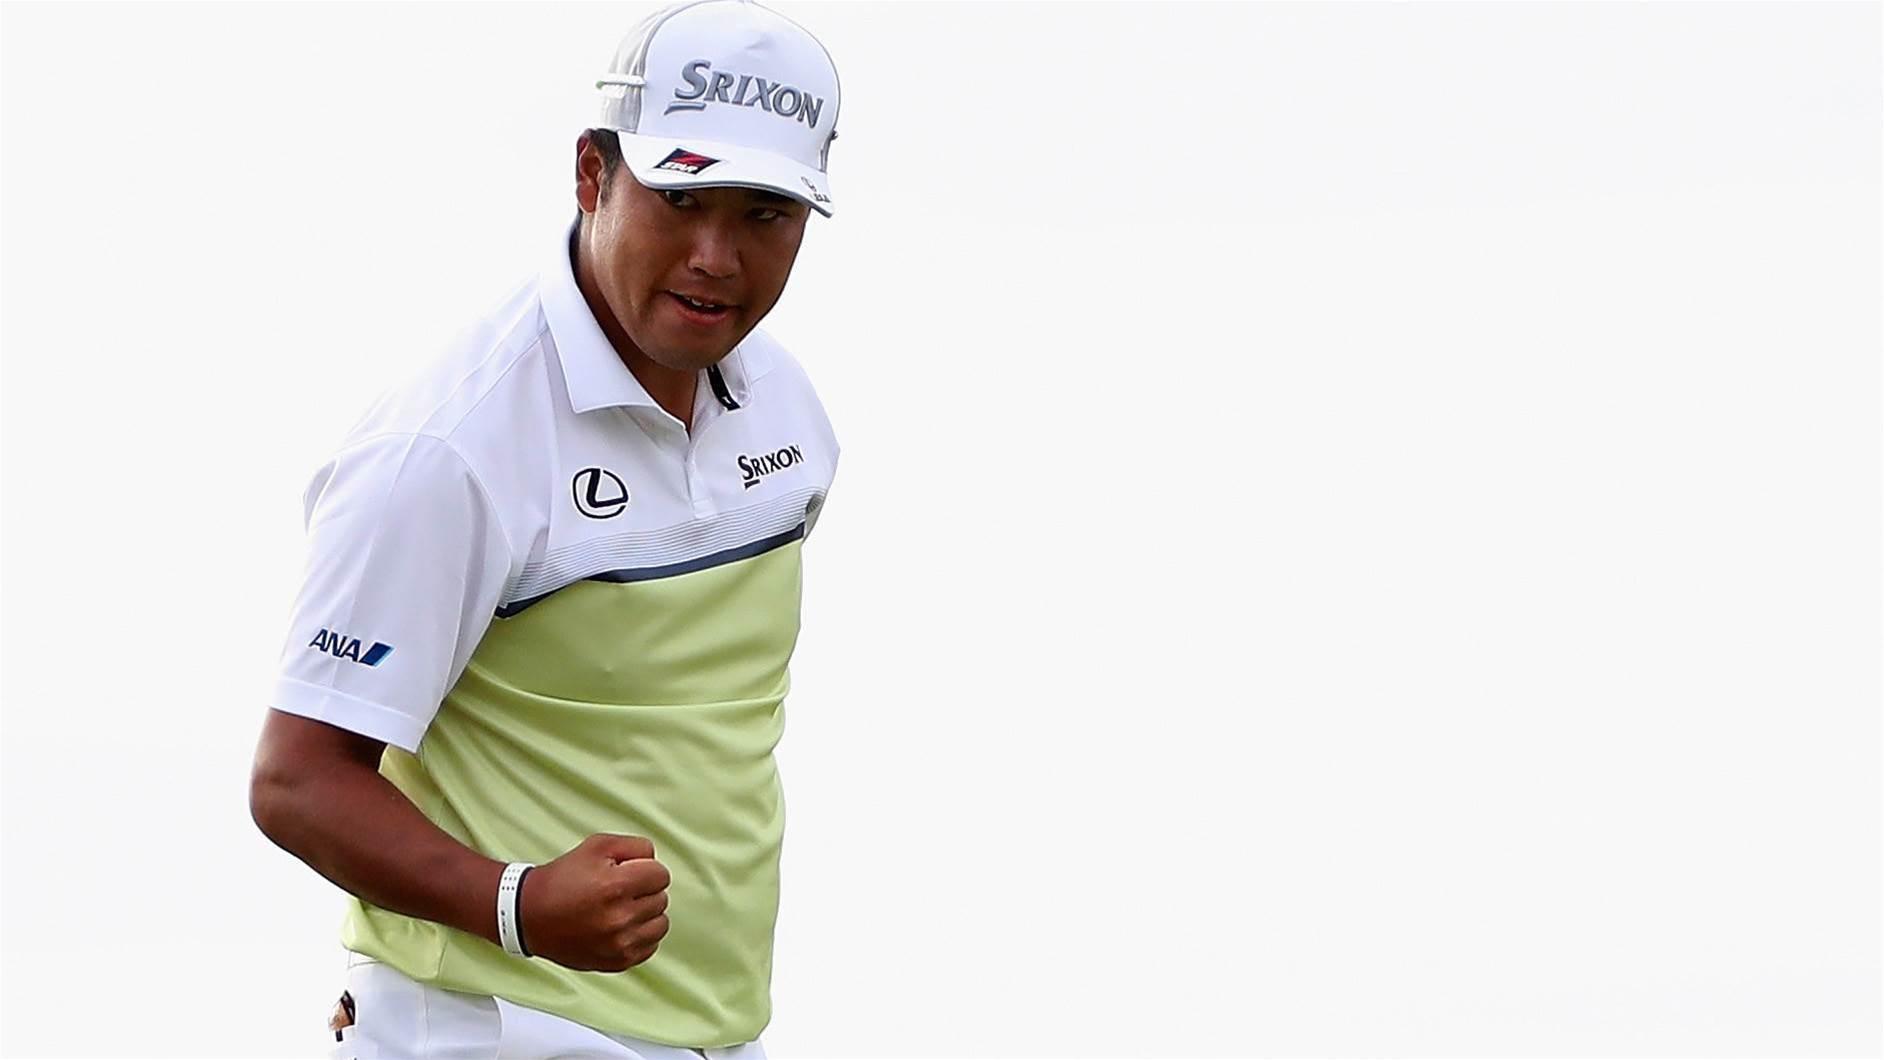 PGA TOUR: Matsuyama continues to rise in Phoenix